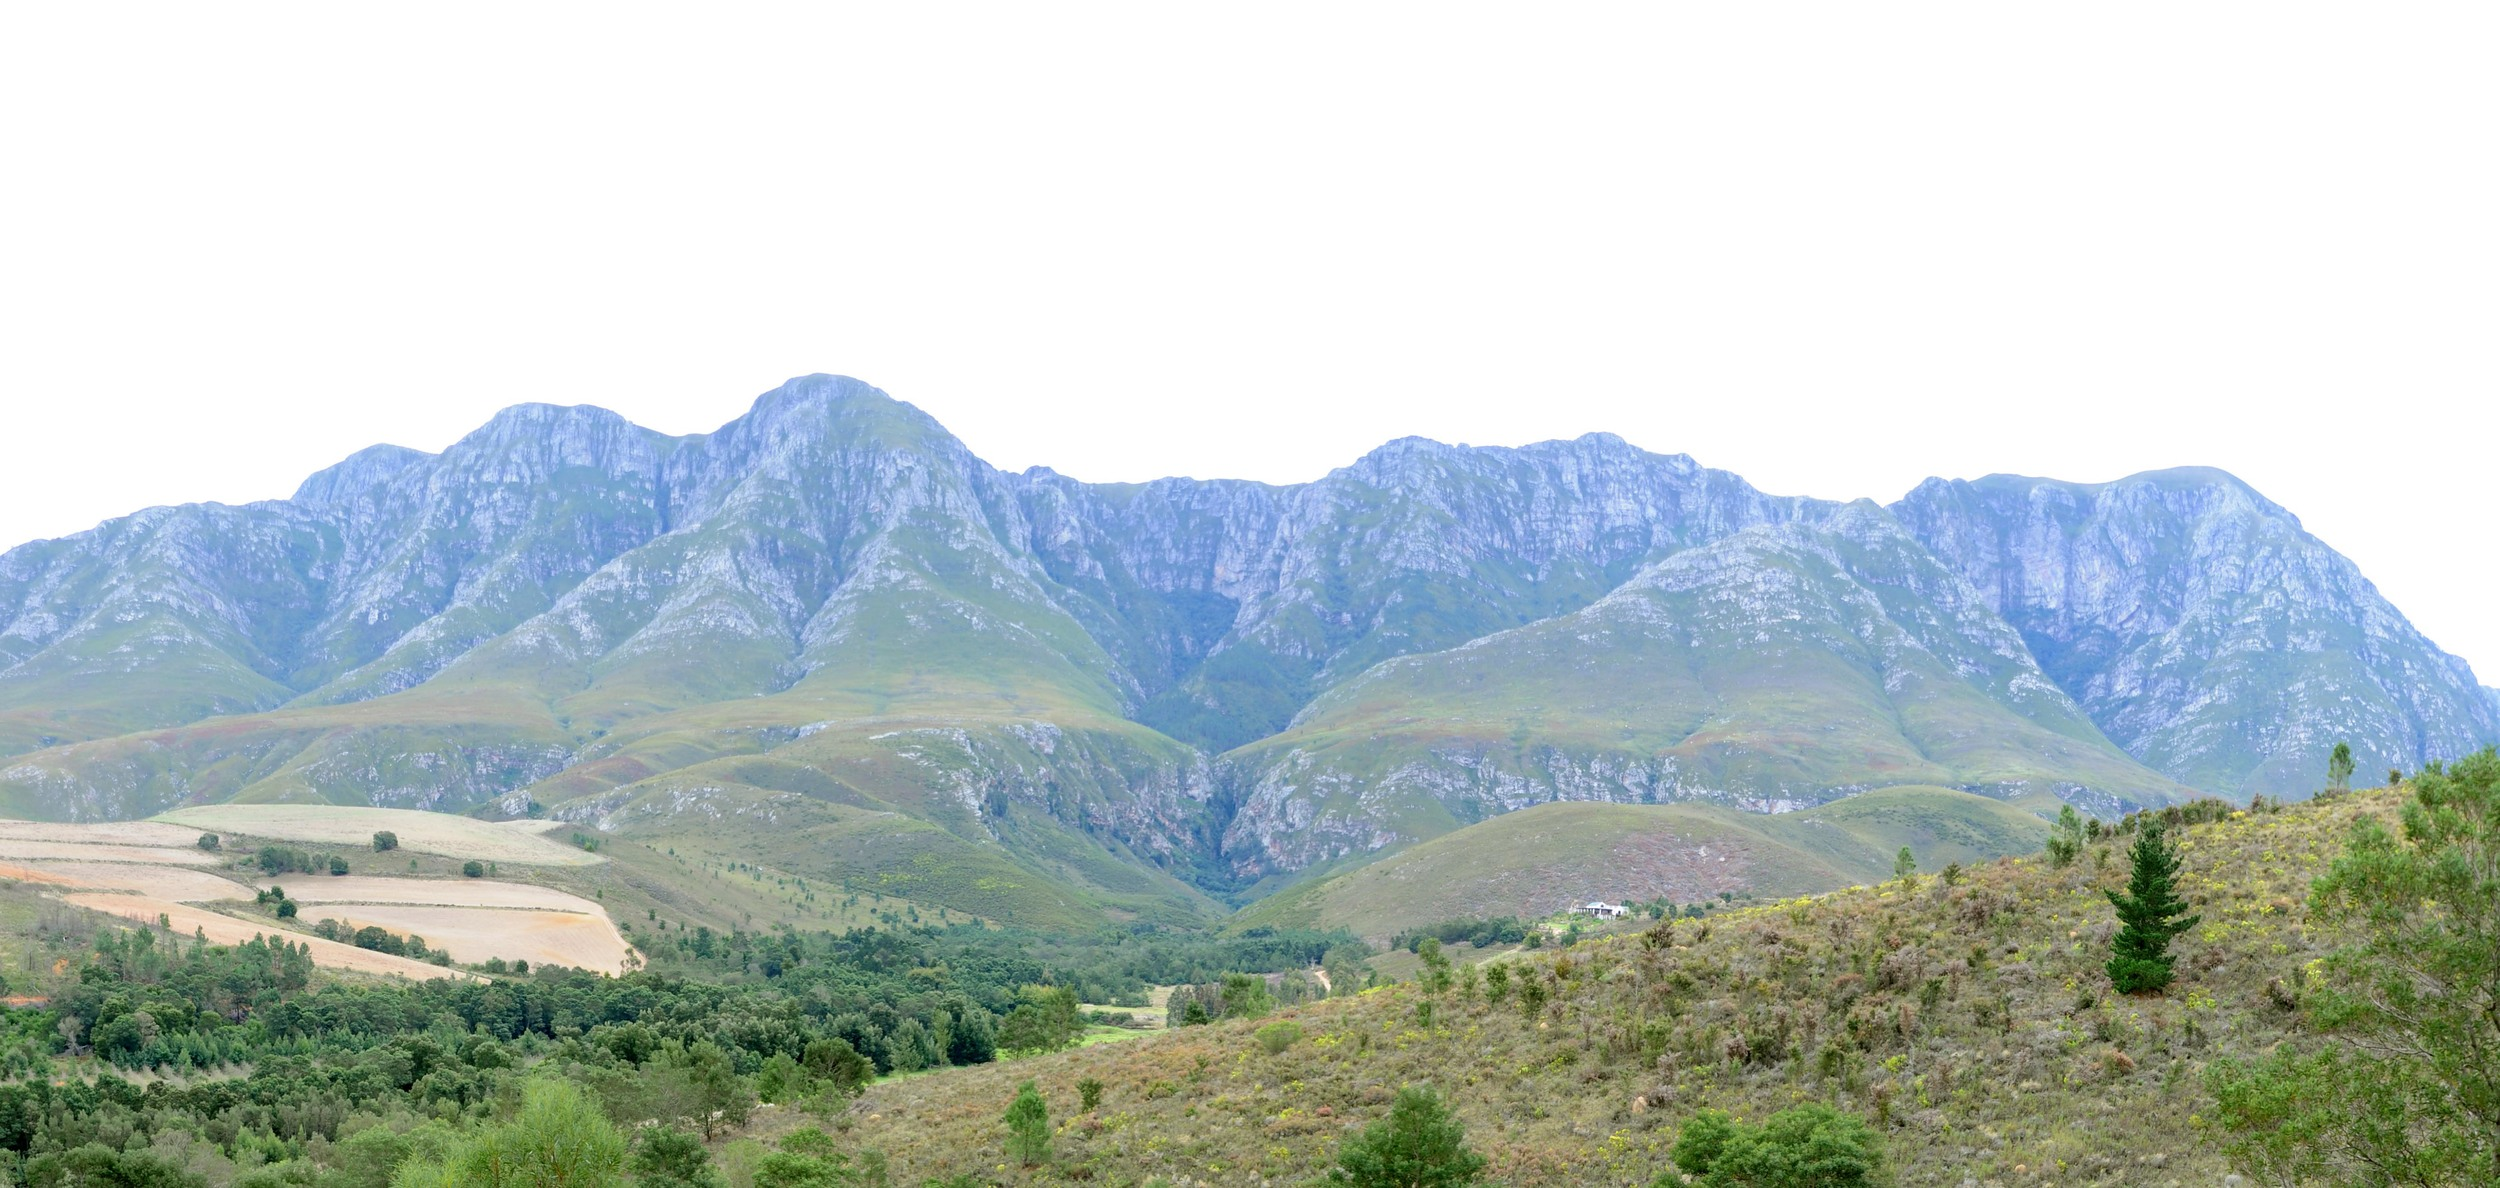 Hemelsbreed berg.jpg